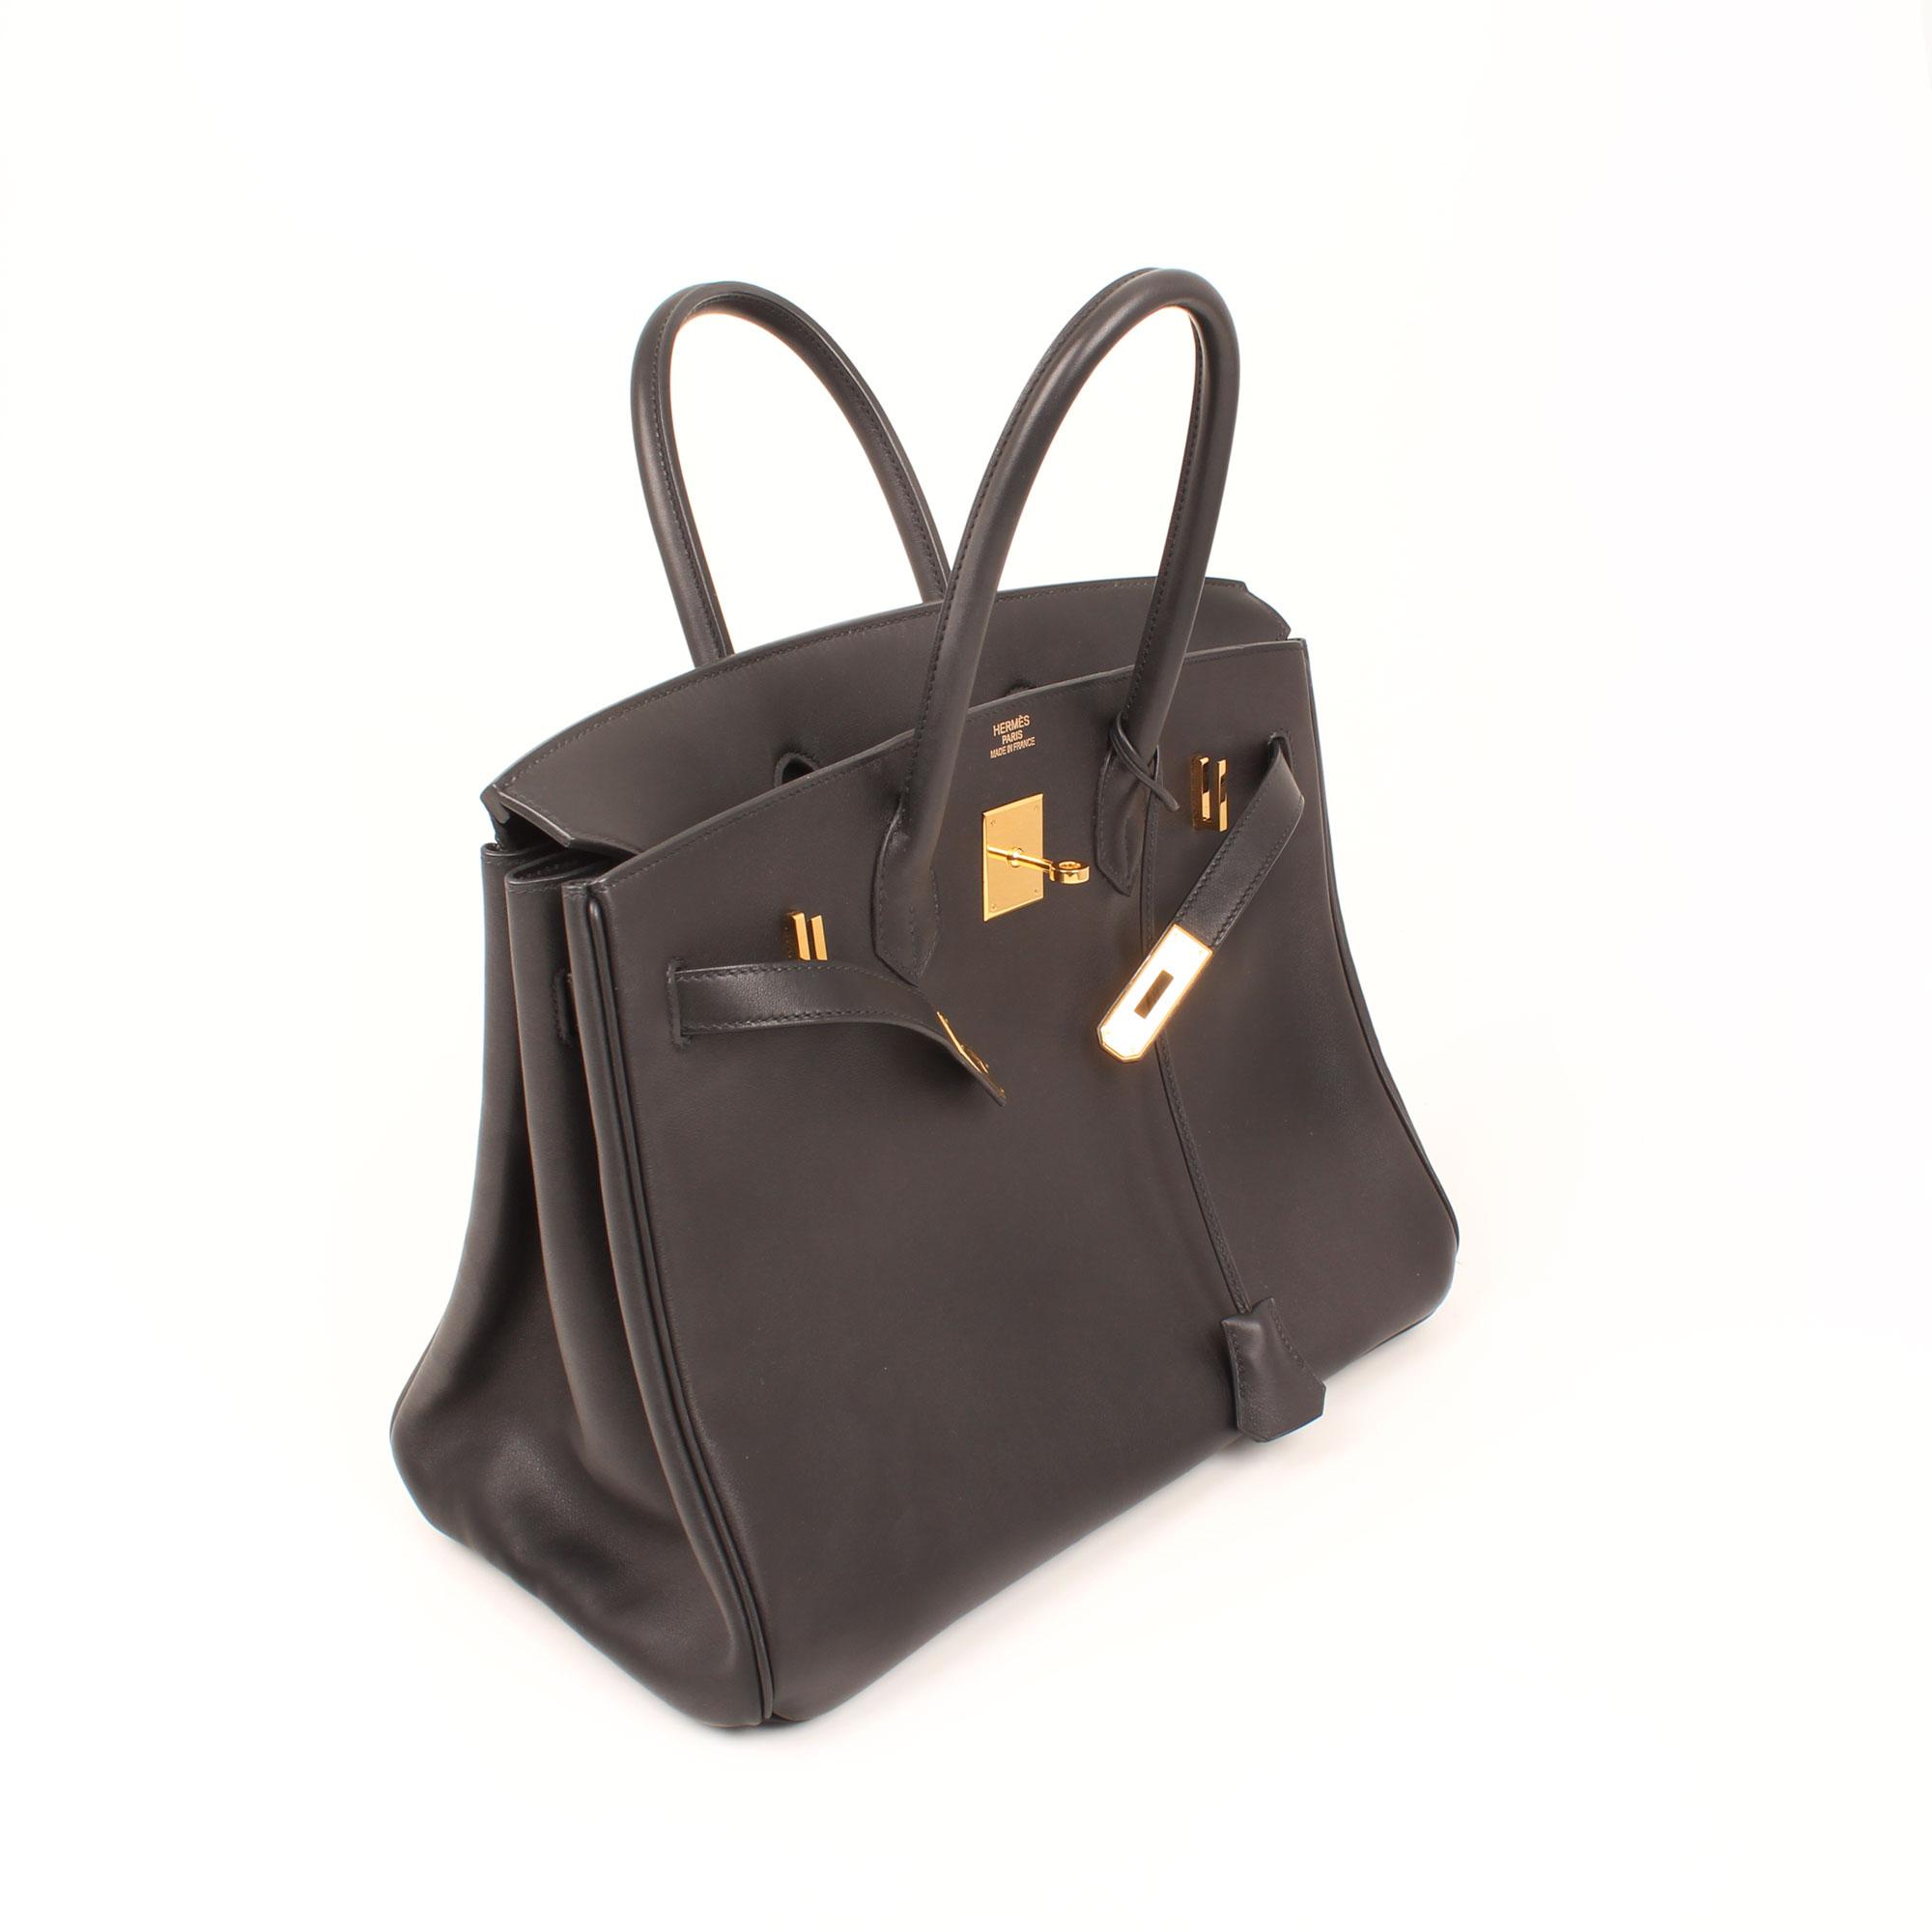 526360daae usa hermes bag messenger entrar 80fb0 1f608  norway hermès birkin 35  handbag black chamonix leather gold i cbl bags 88ad6 d871d